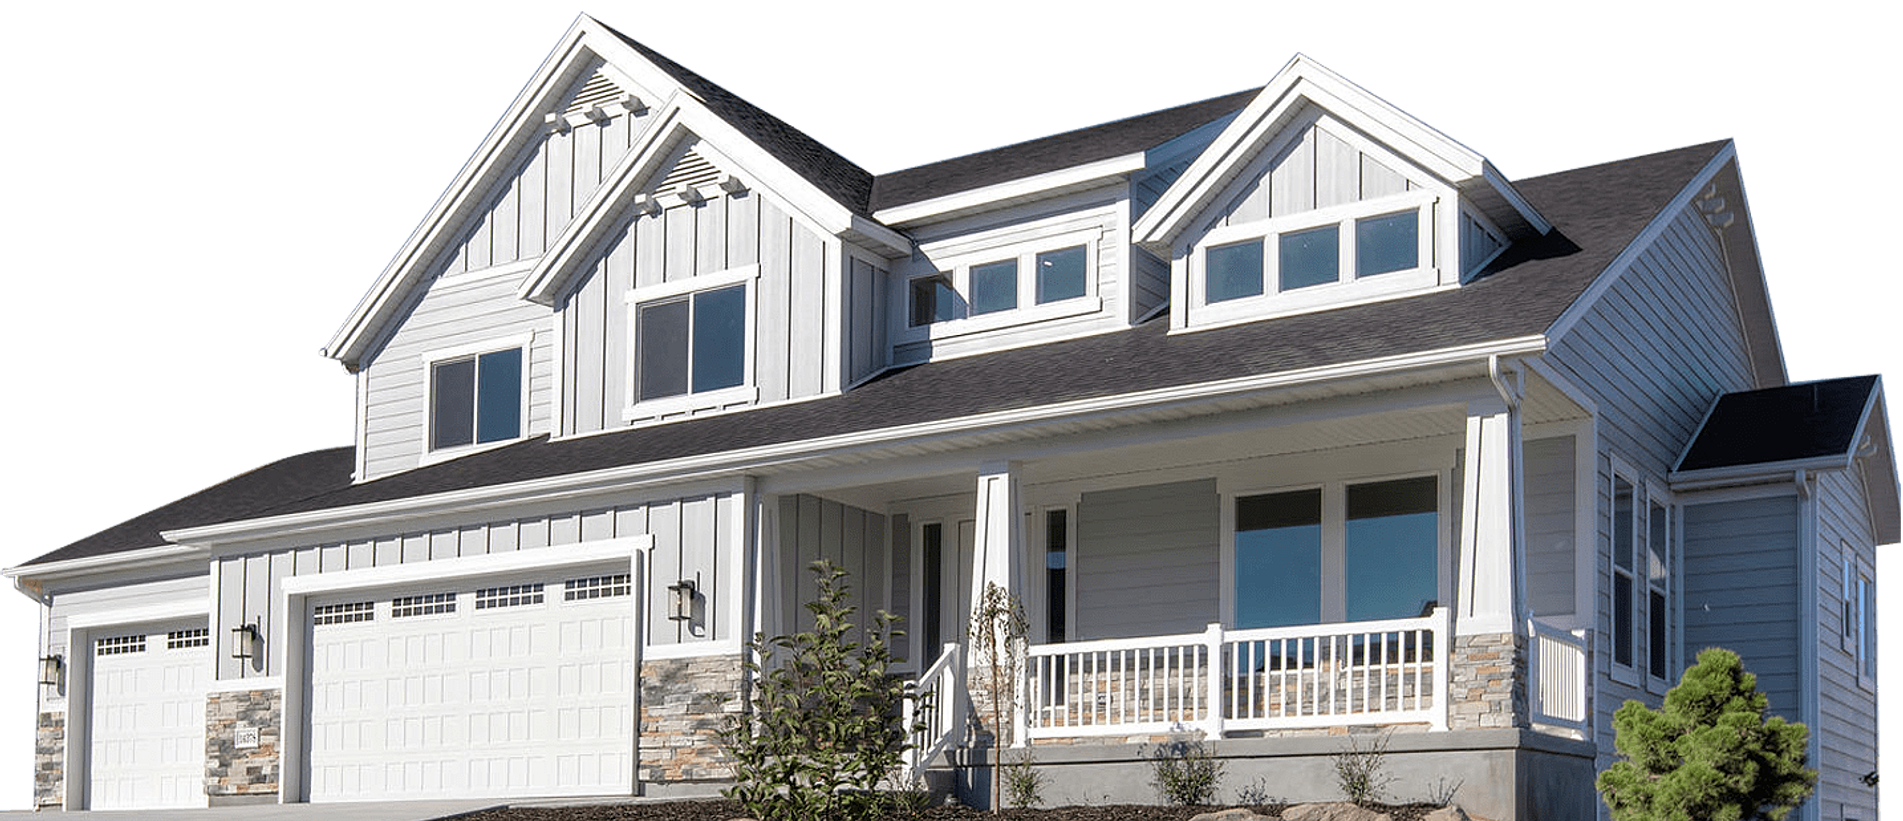 House Plans Idaho Falls House Plans